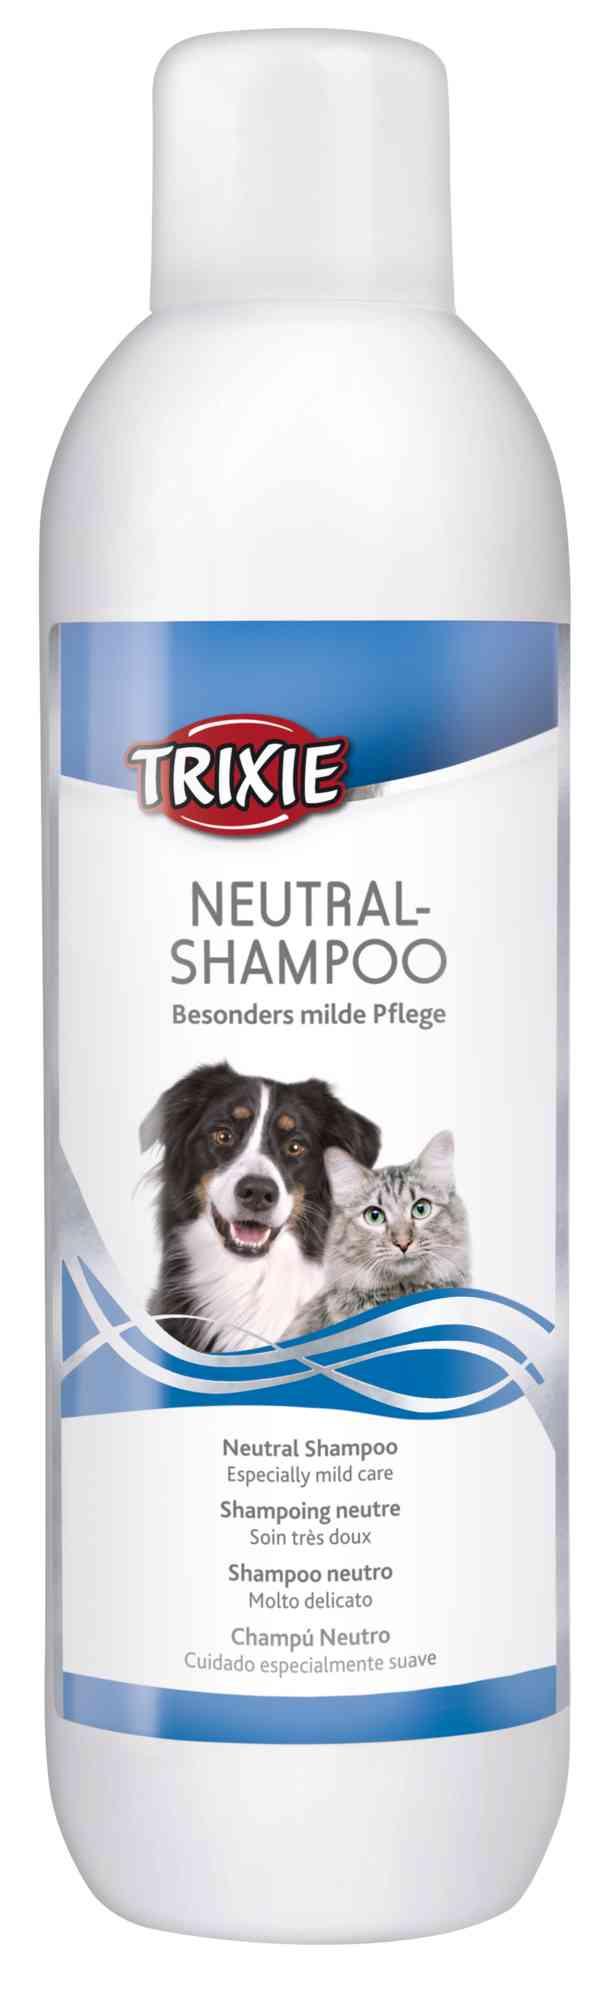 TRIXIE Neutral-Shampoo TRIXIE Neutral-Shampoo, 1 l